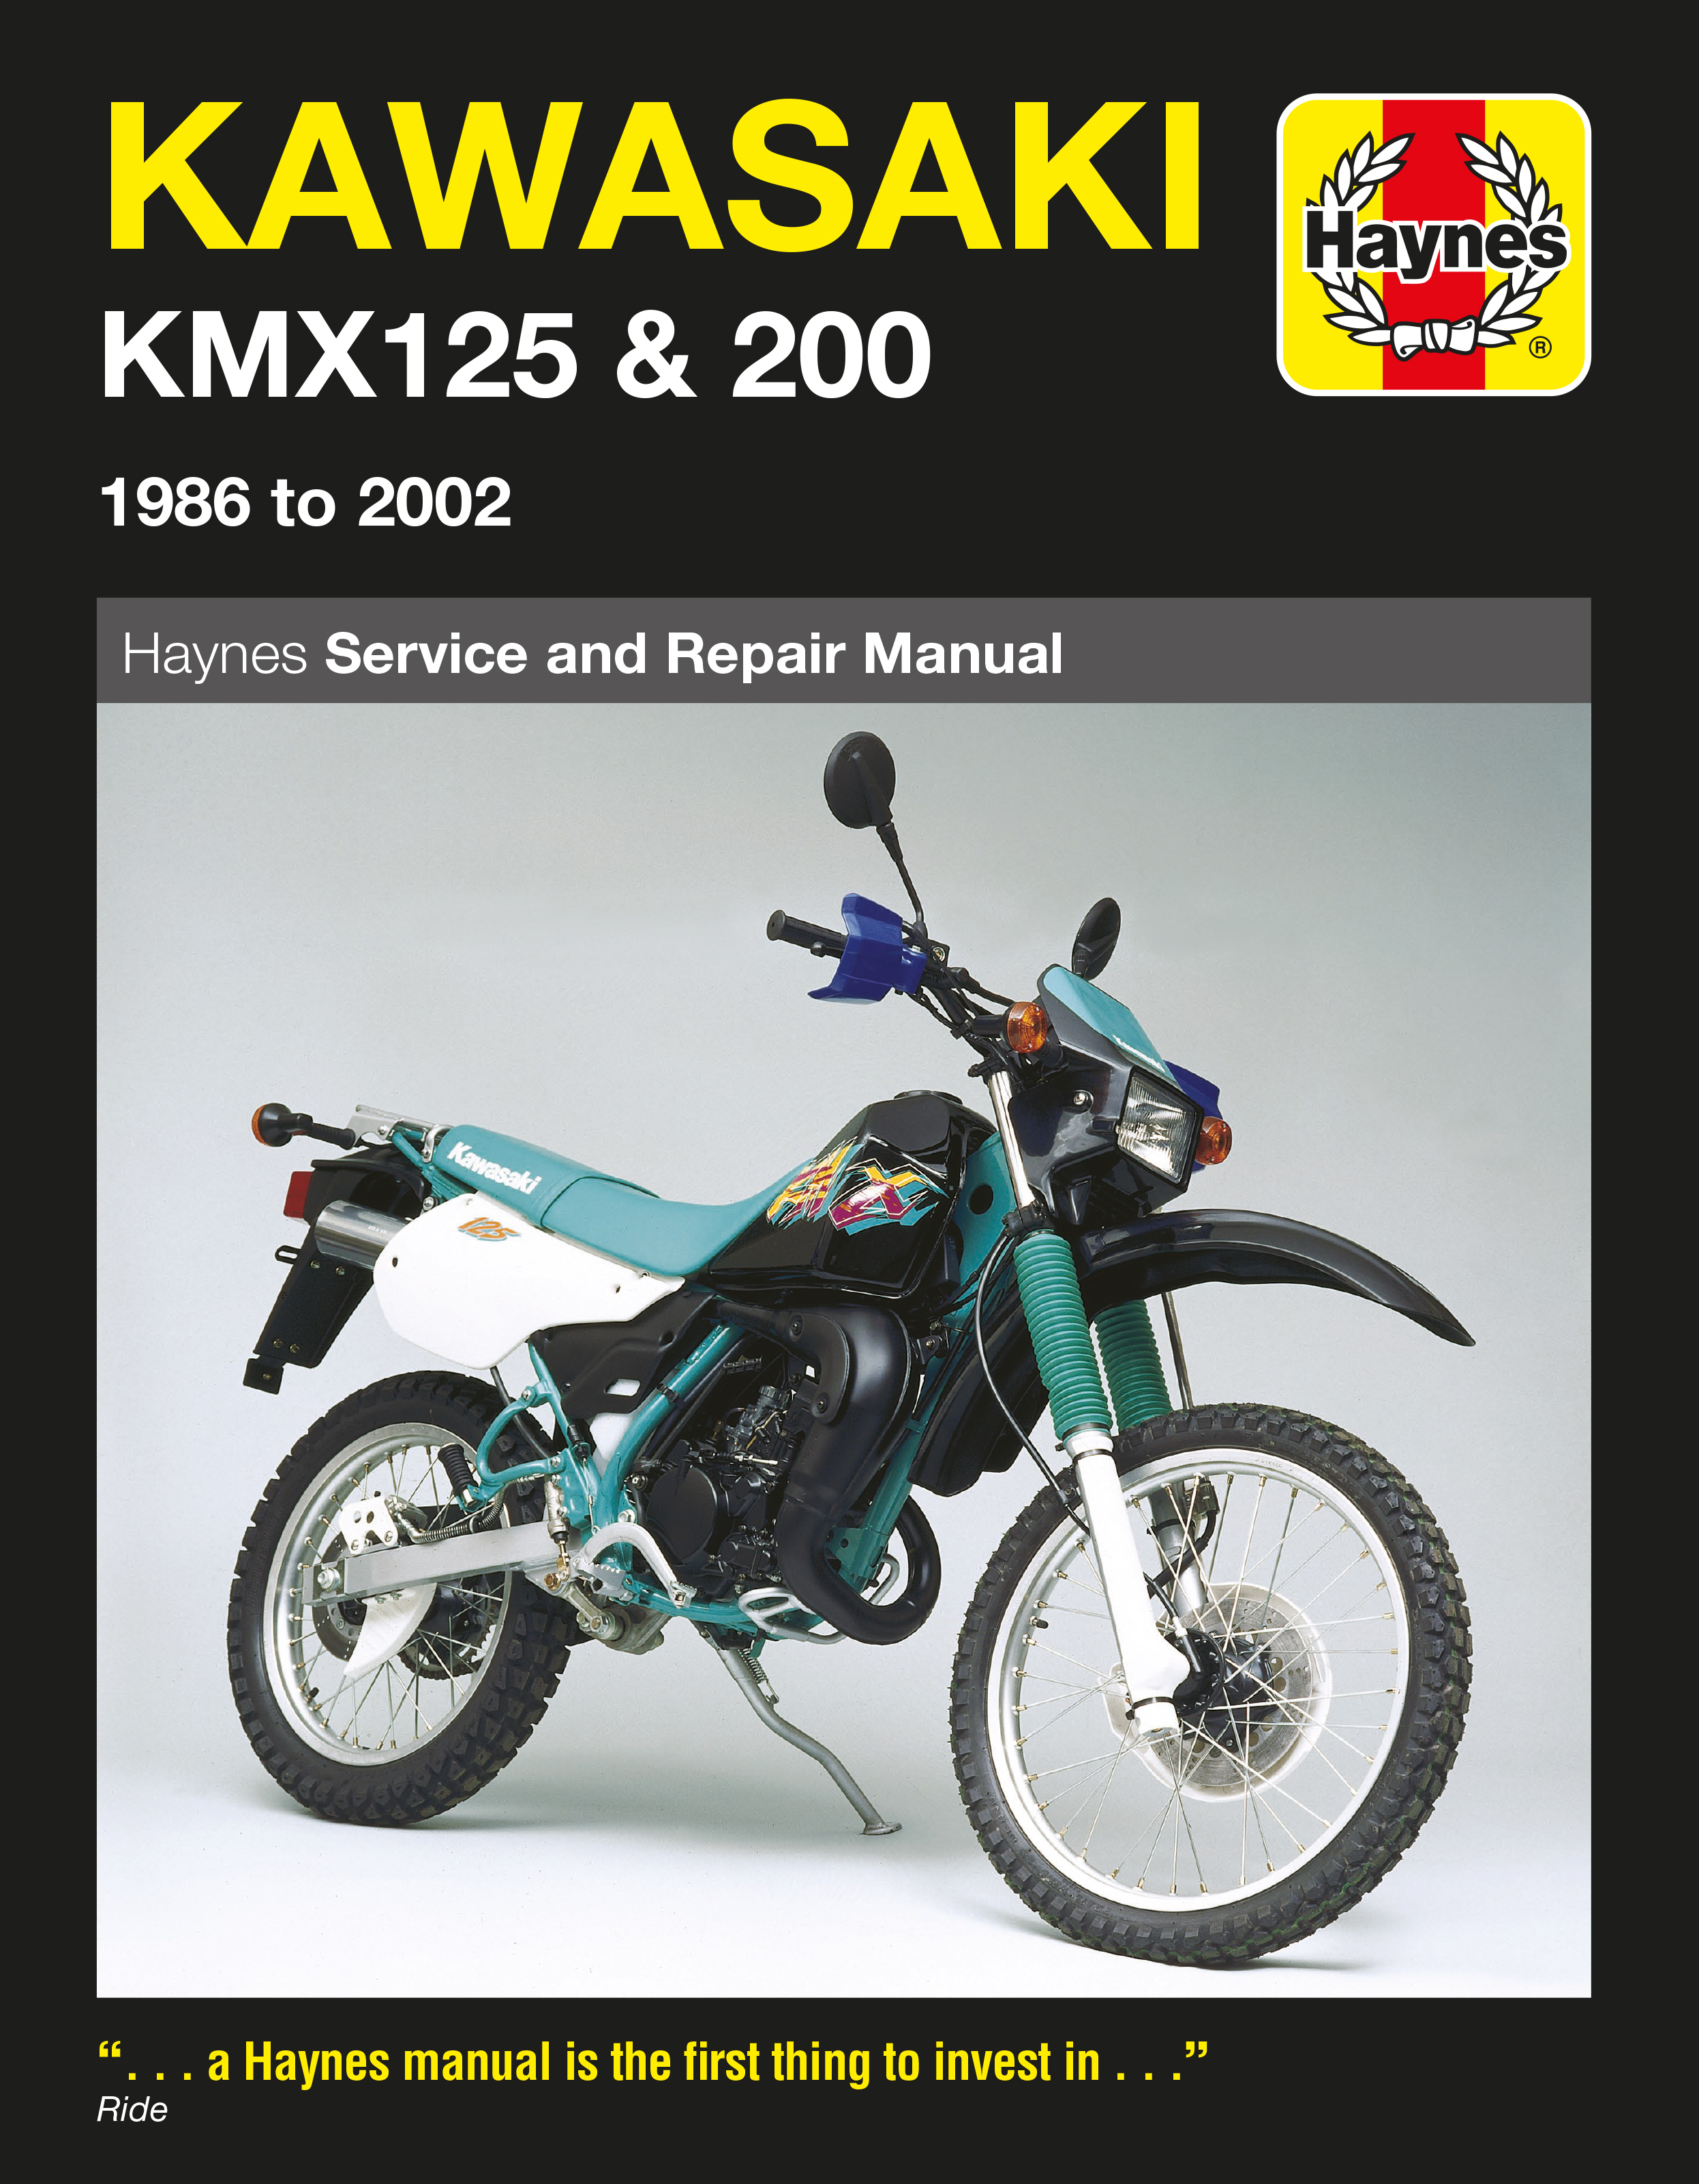 Kawasaki KMX125 & 200 (86 - 02) Haynes Repair Manual